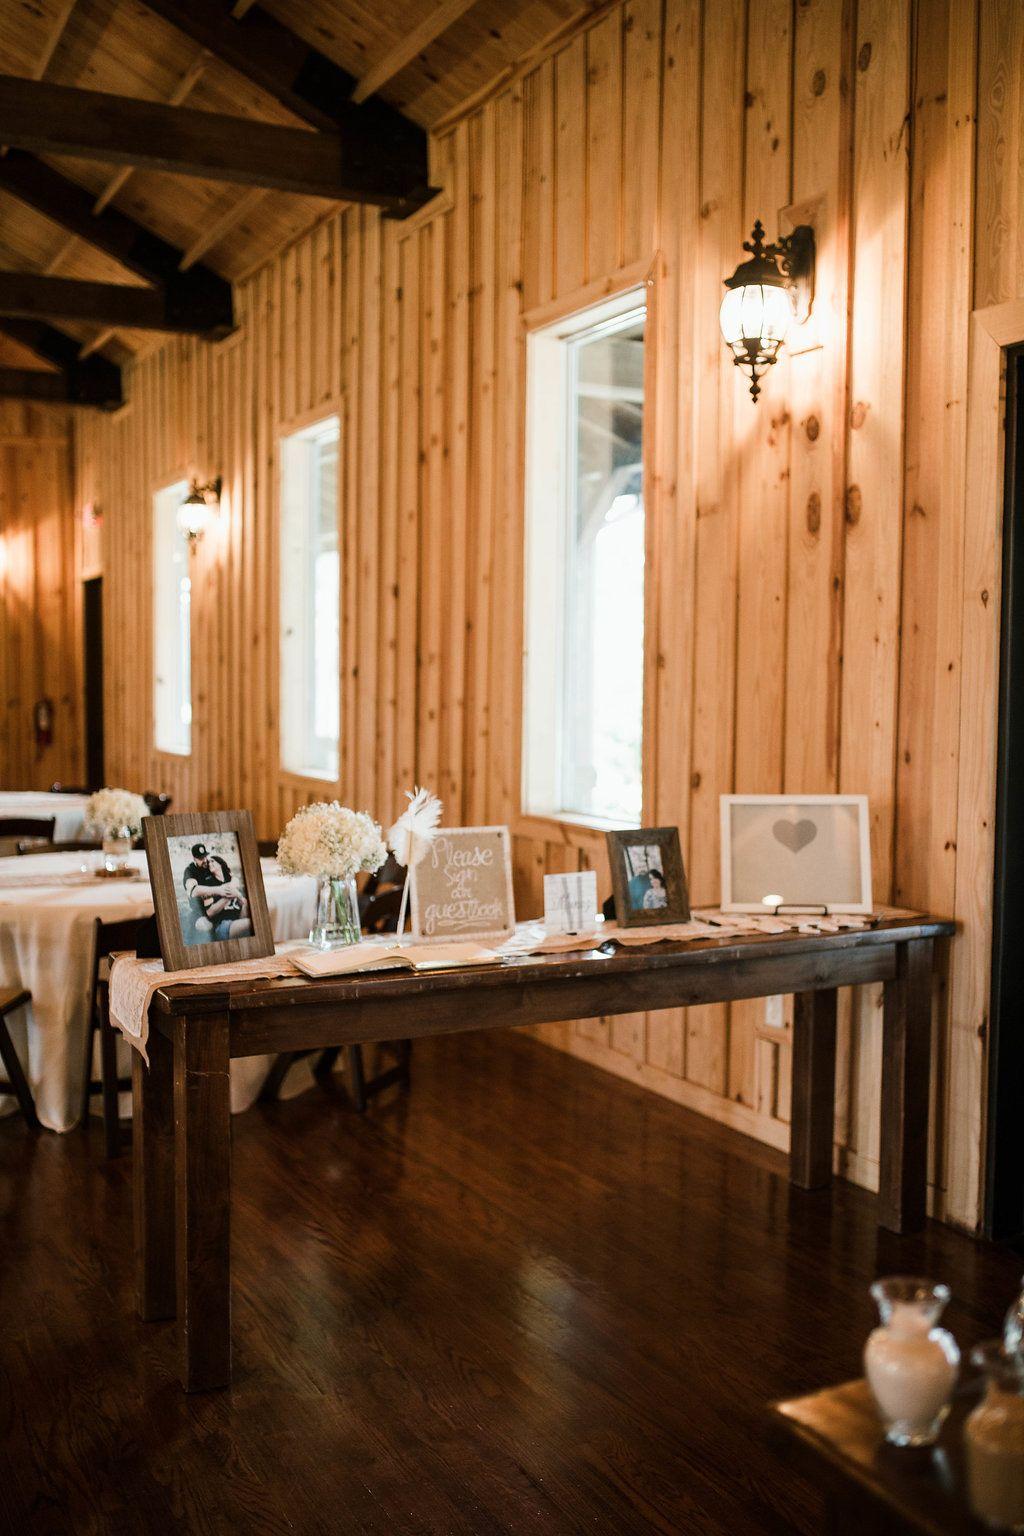 Wedding venue decoration images  Pinehaven Wedding Venue  wedding decor  Pinterest  Rustic wedding